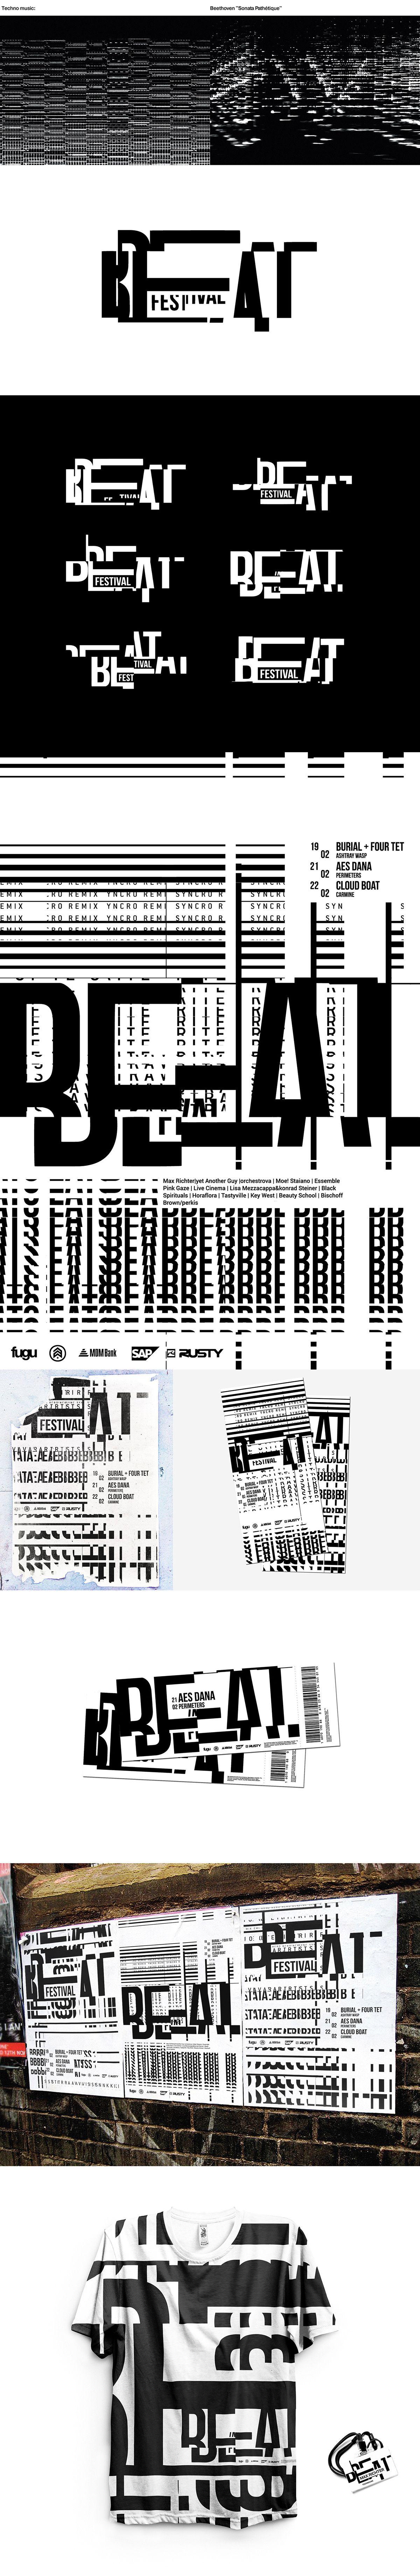 Identity / beat festival